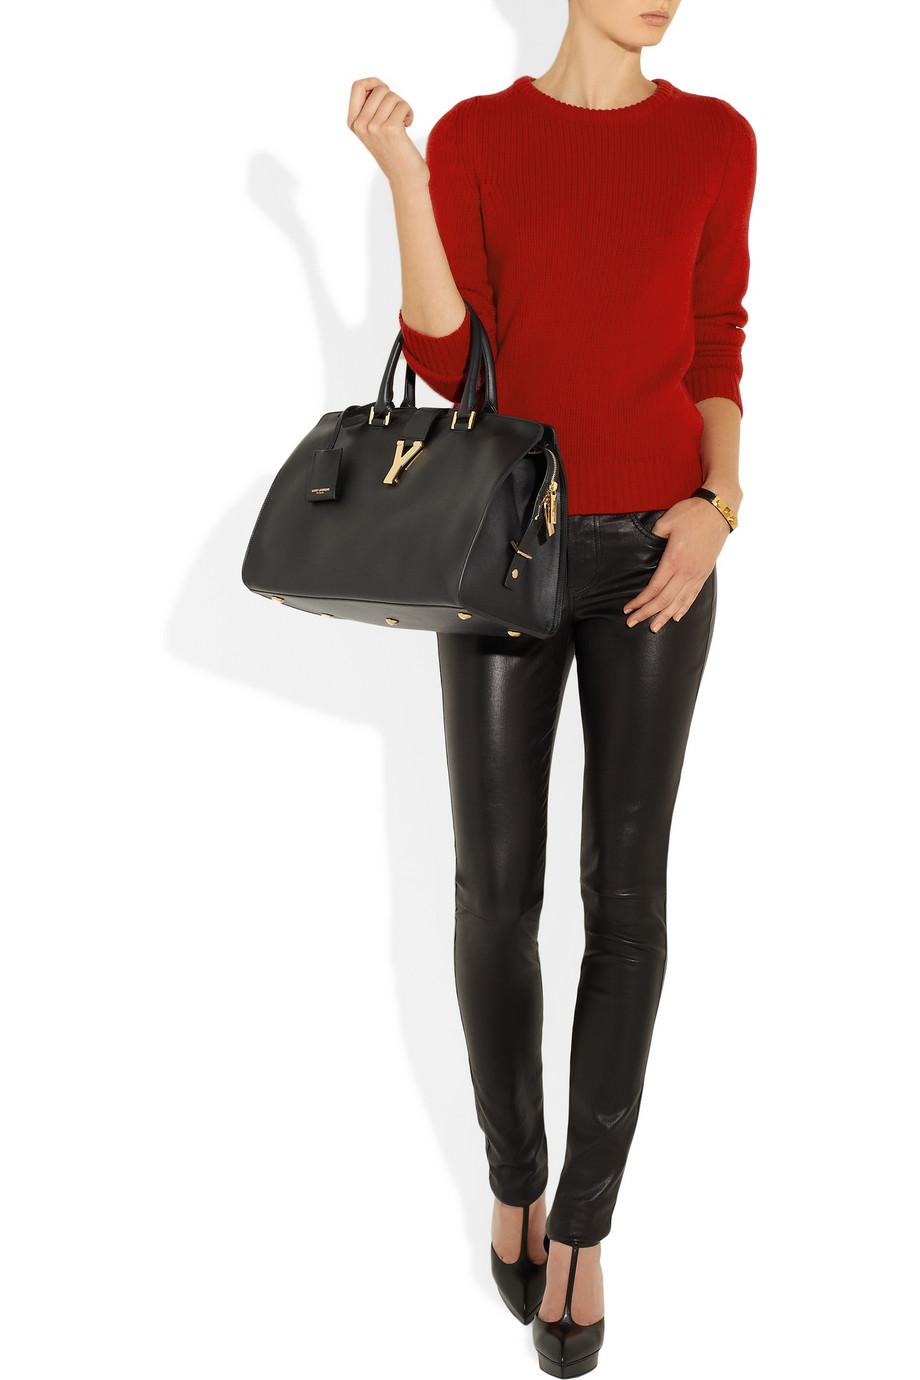 college handbag - yves saint laurent cabas monogram small leather tote, ysl sale ...